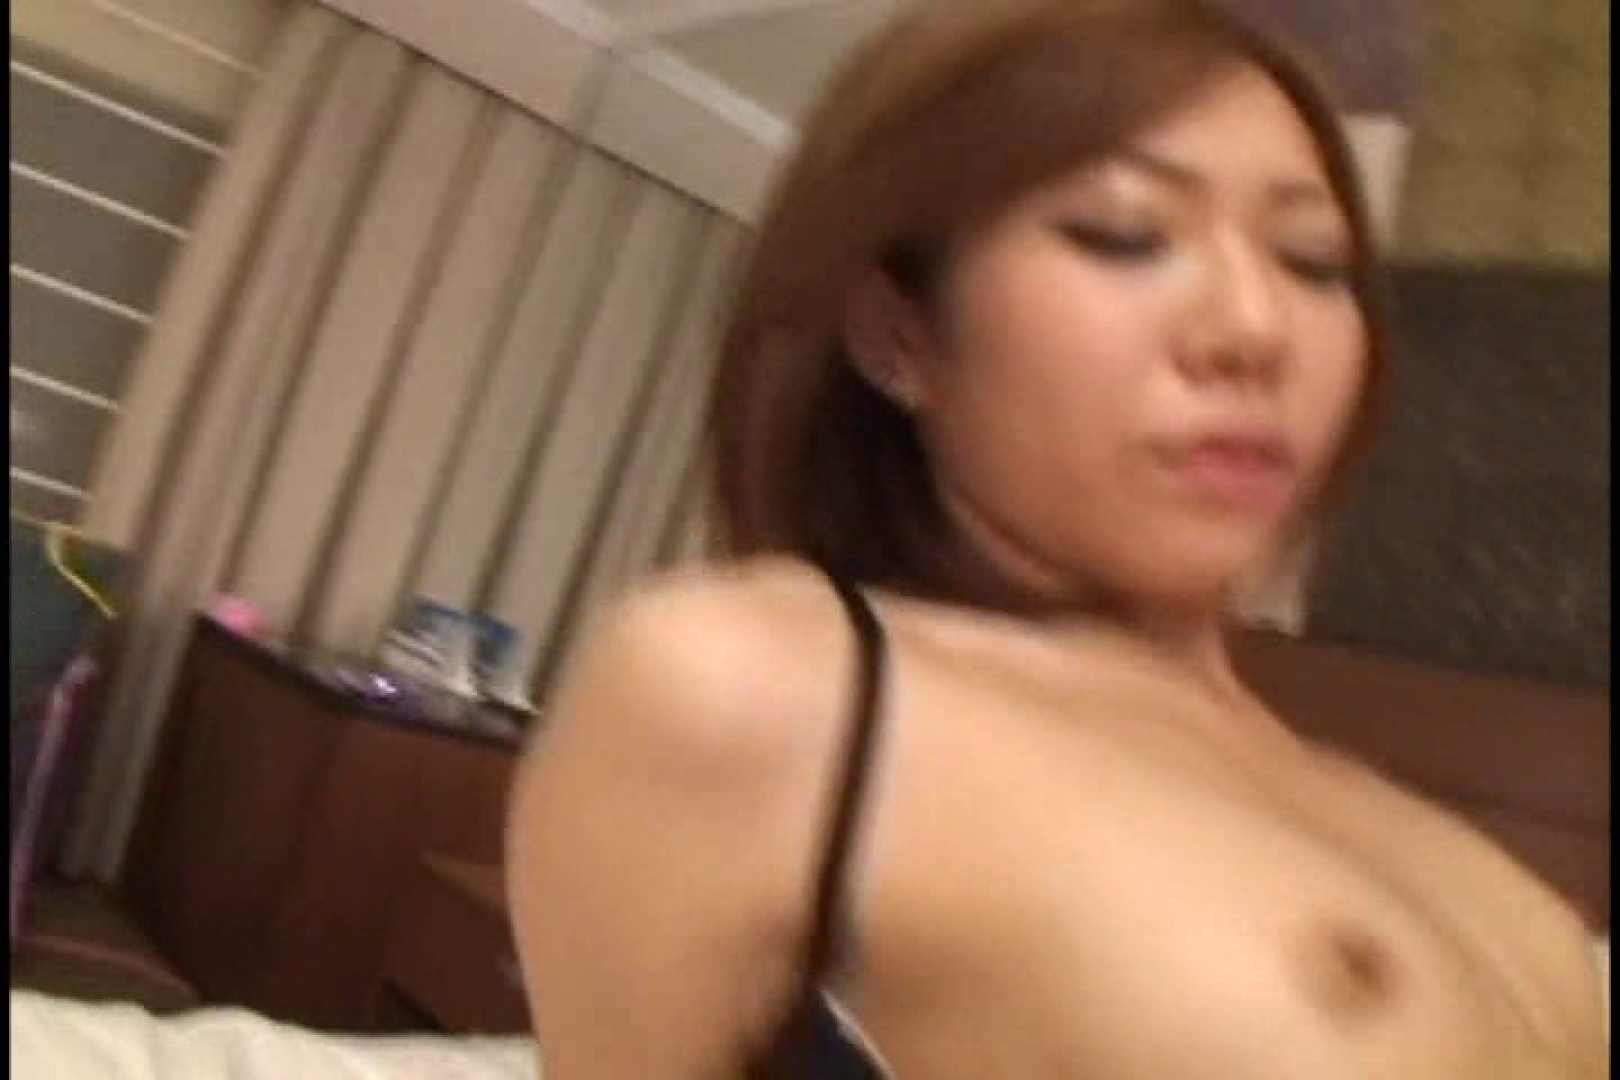 JDハンター全国ツアー vol.036 後編 OL女体   萌え女子大生  69連発 5